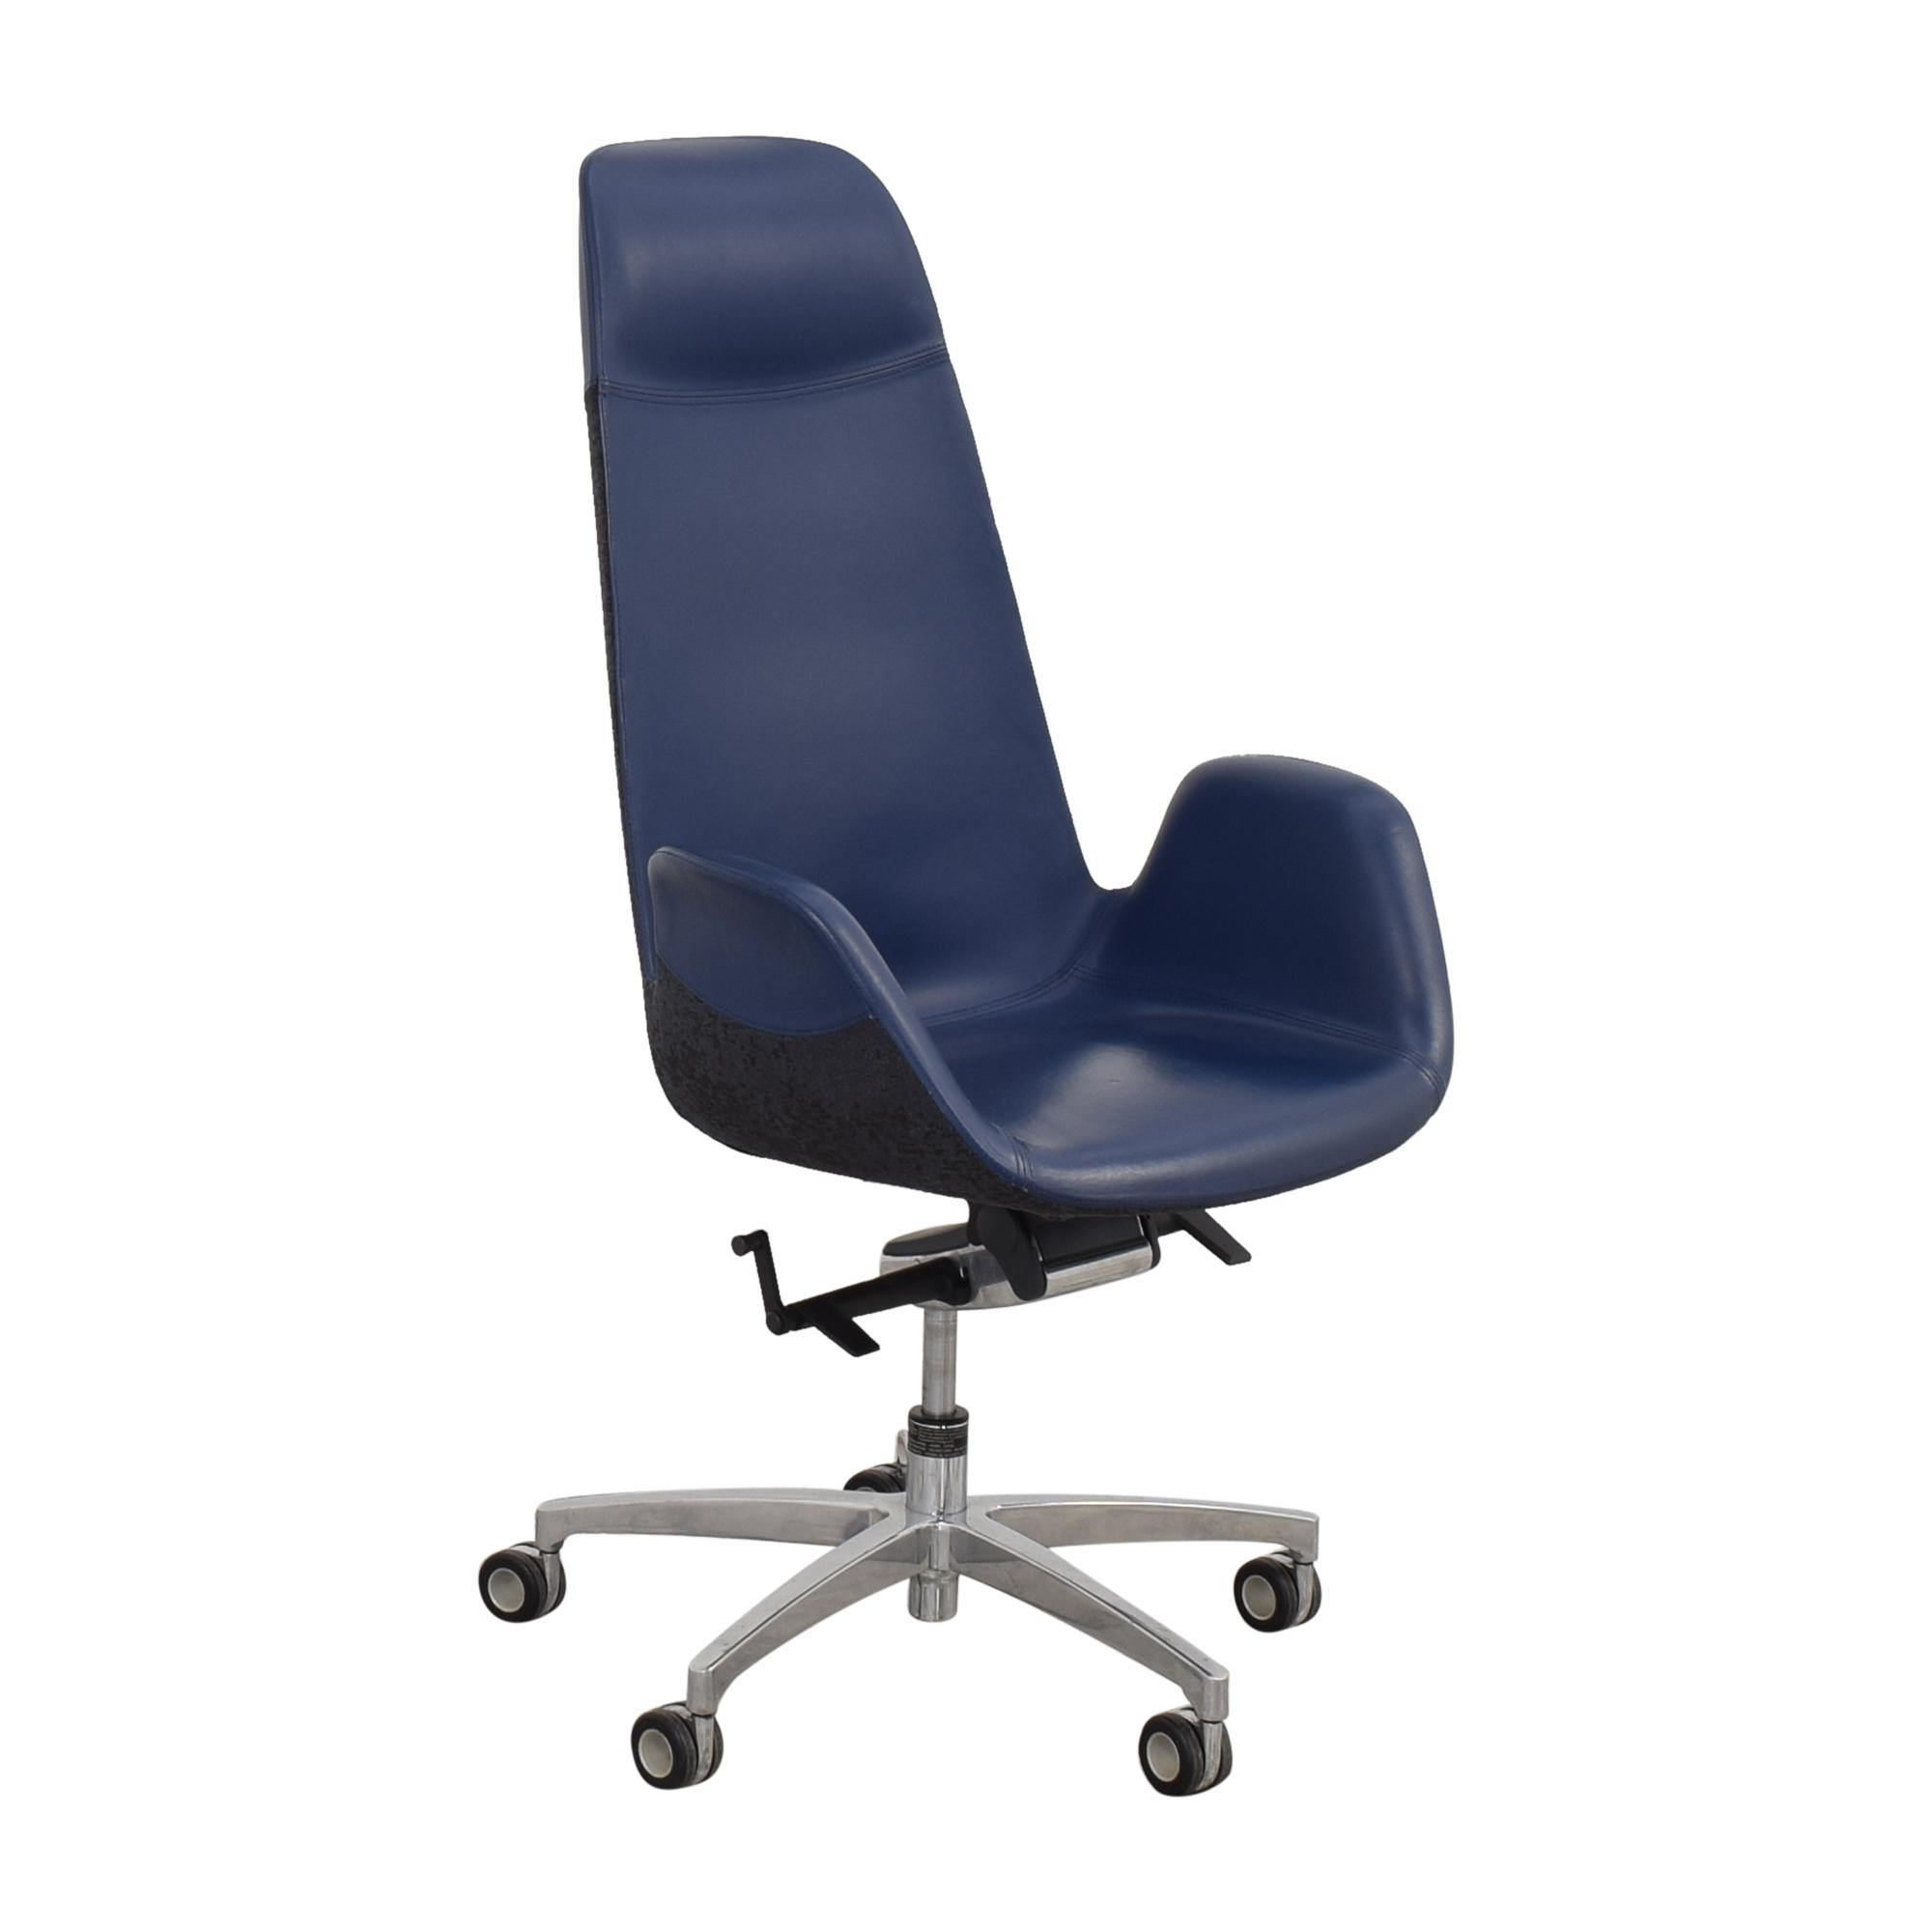 Koleksiyon Koleksiyon Halia High Back Office Chair dimensions